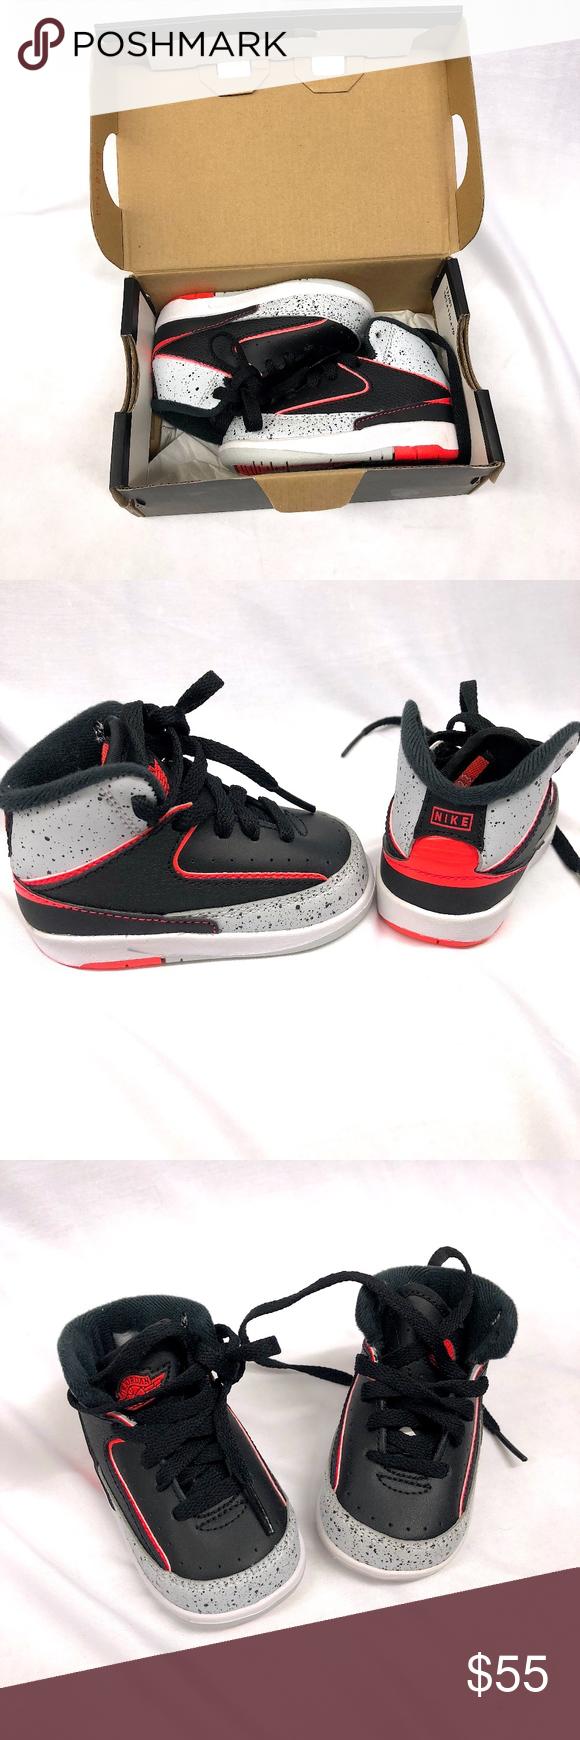 Jordan Shoes | Jordan 2 Retro (Bt) Baby Toddlers Shoes